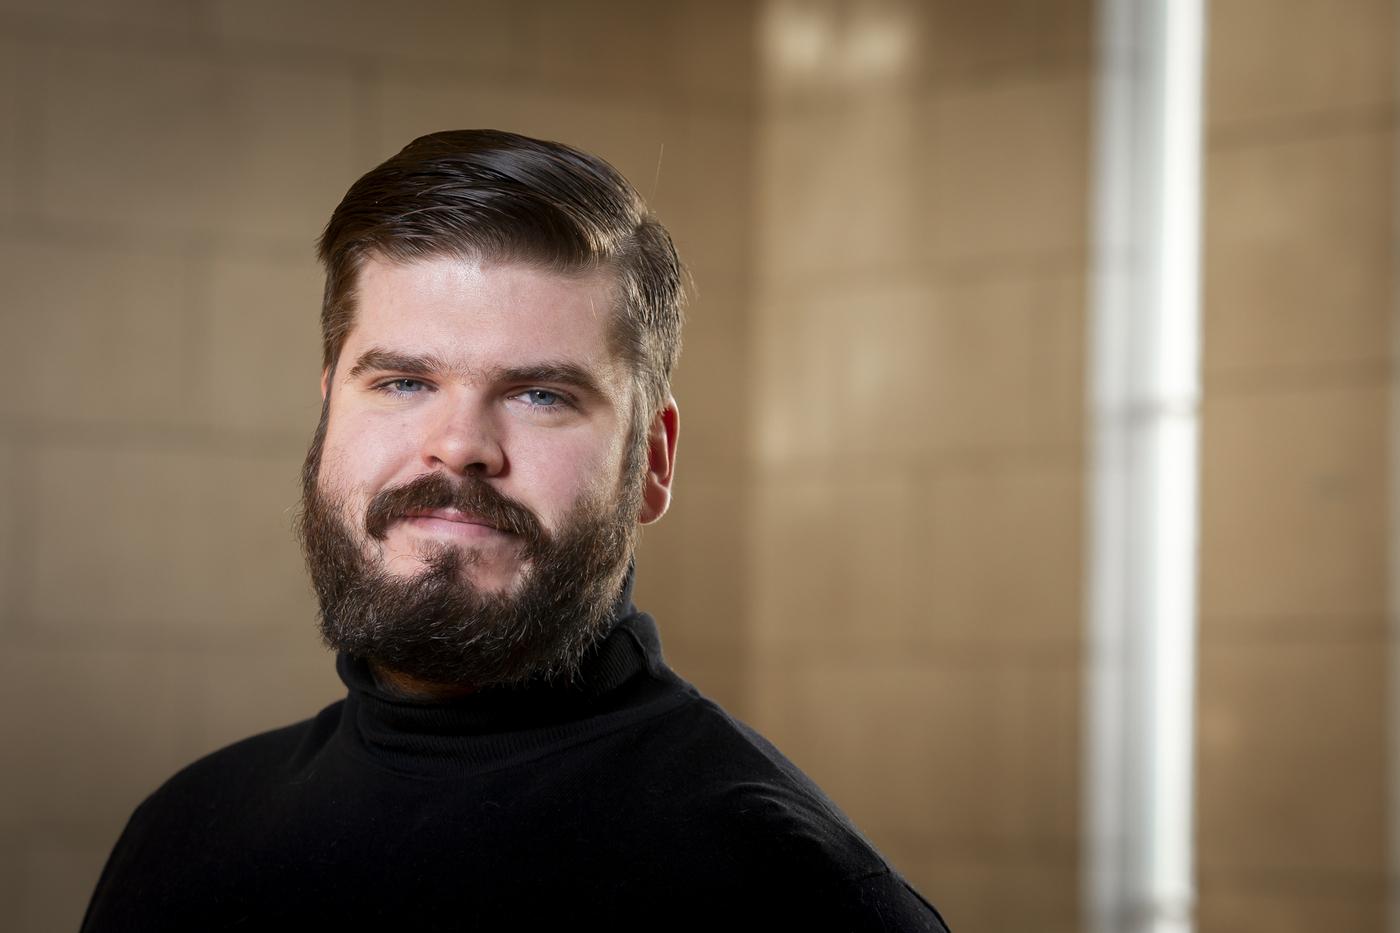 Brynjólfur Gauti Jónsson